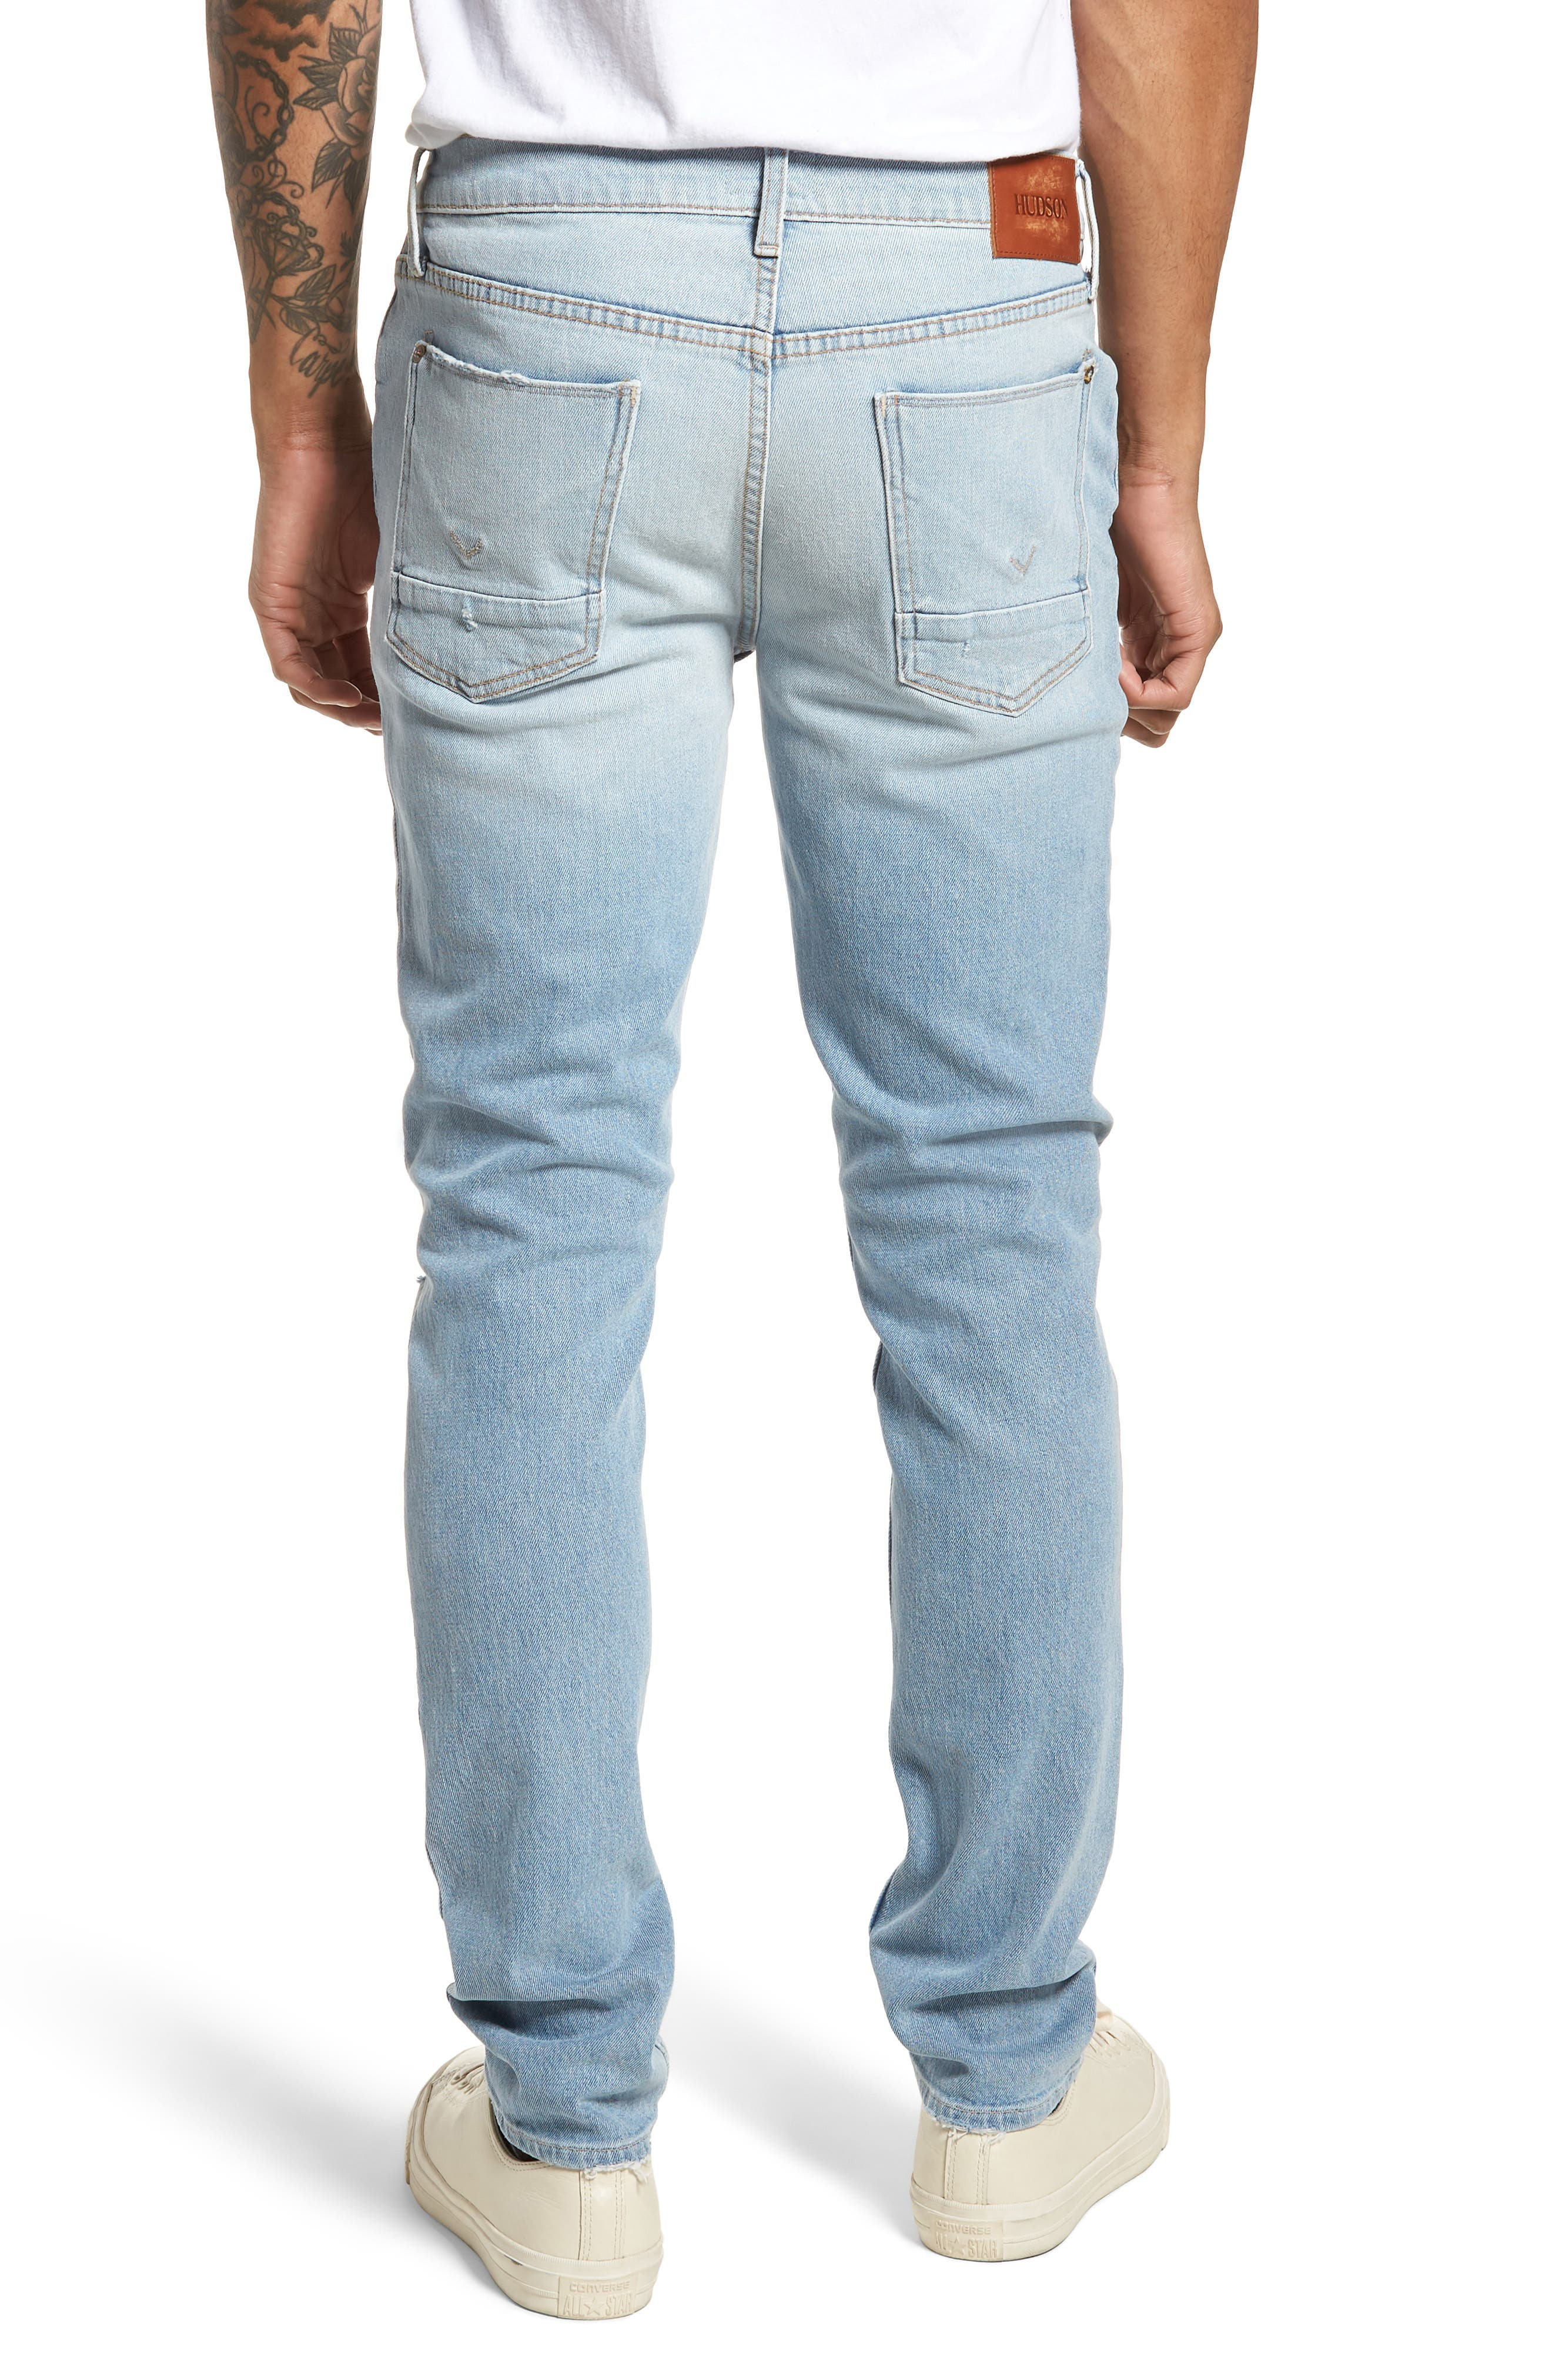 Axl Skinny Fit Jeans,                             Alternate thumbnail 2, color,                             BLAZE